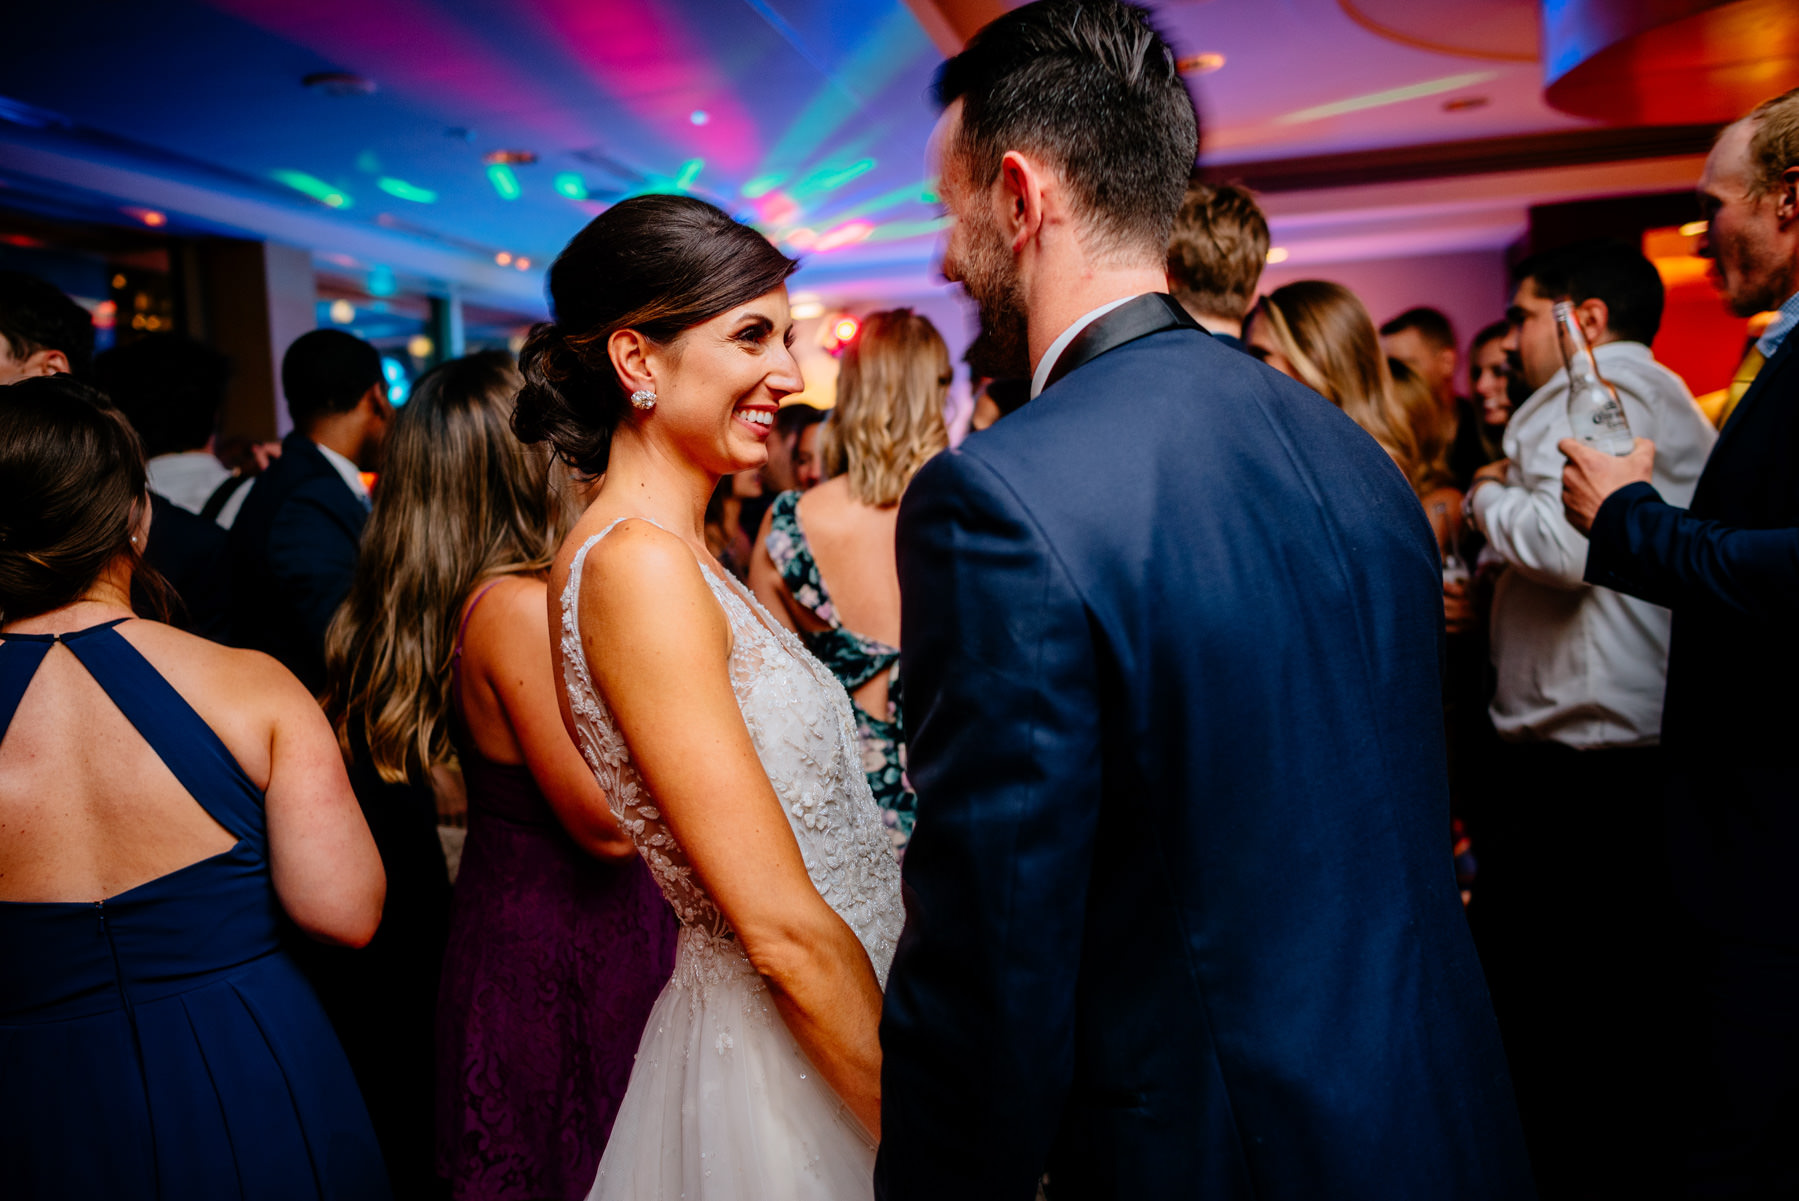 smiling bride at reception